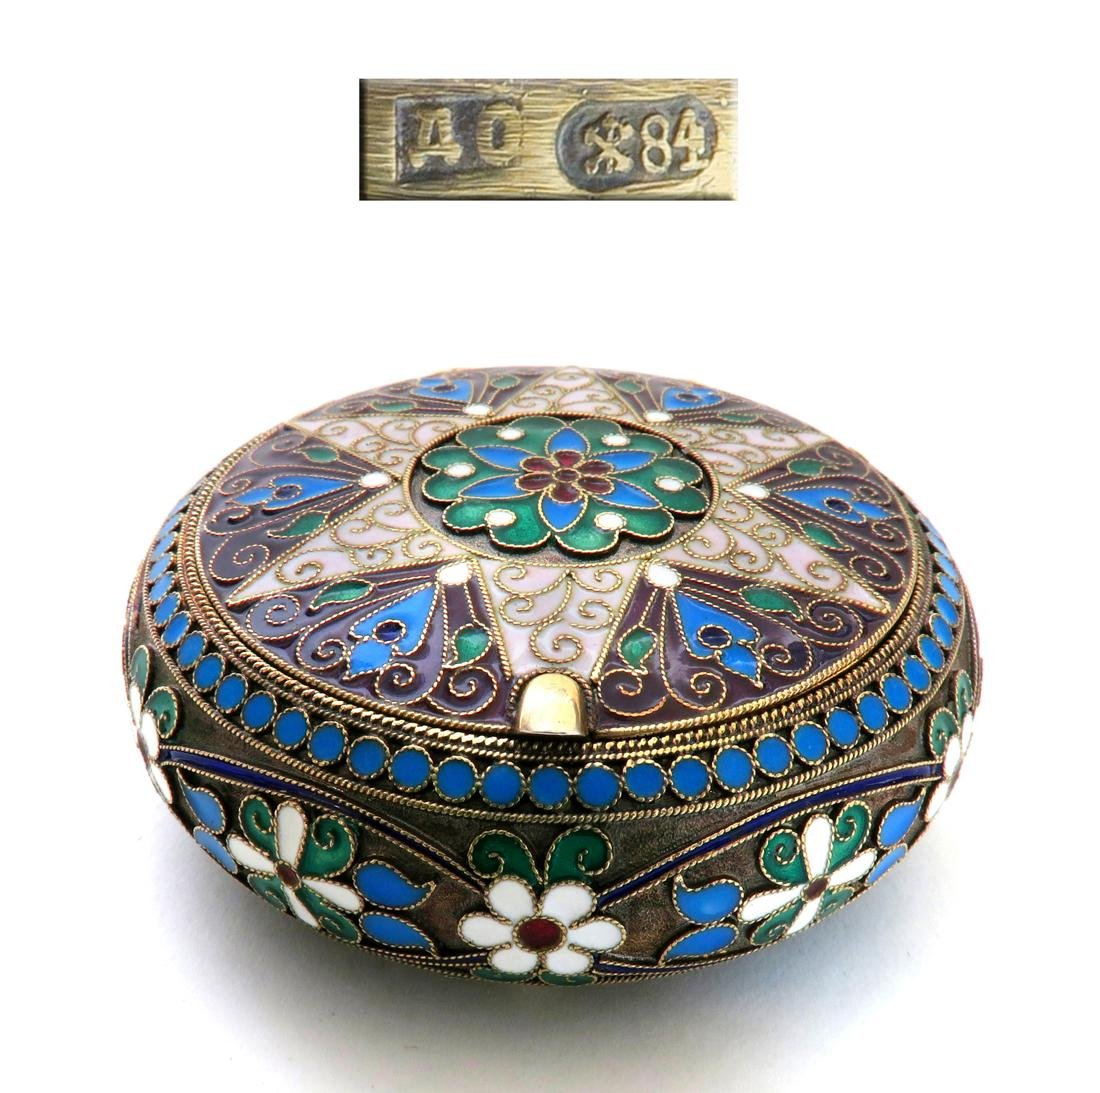 A Large 19th C. Russian Silver Enamel Box